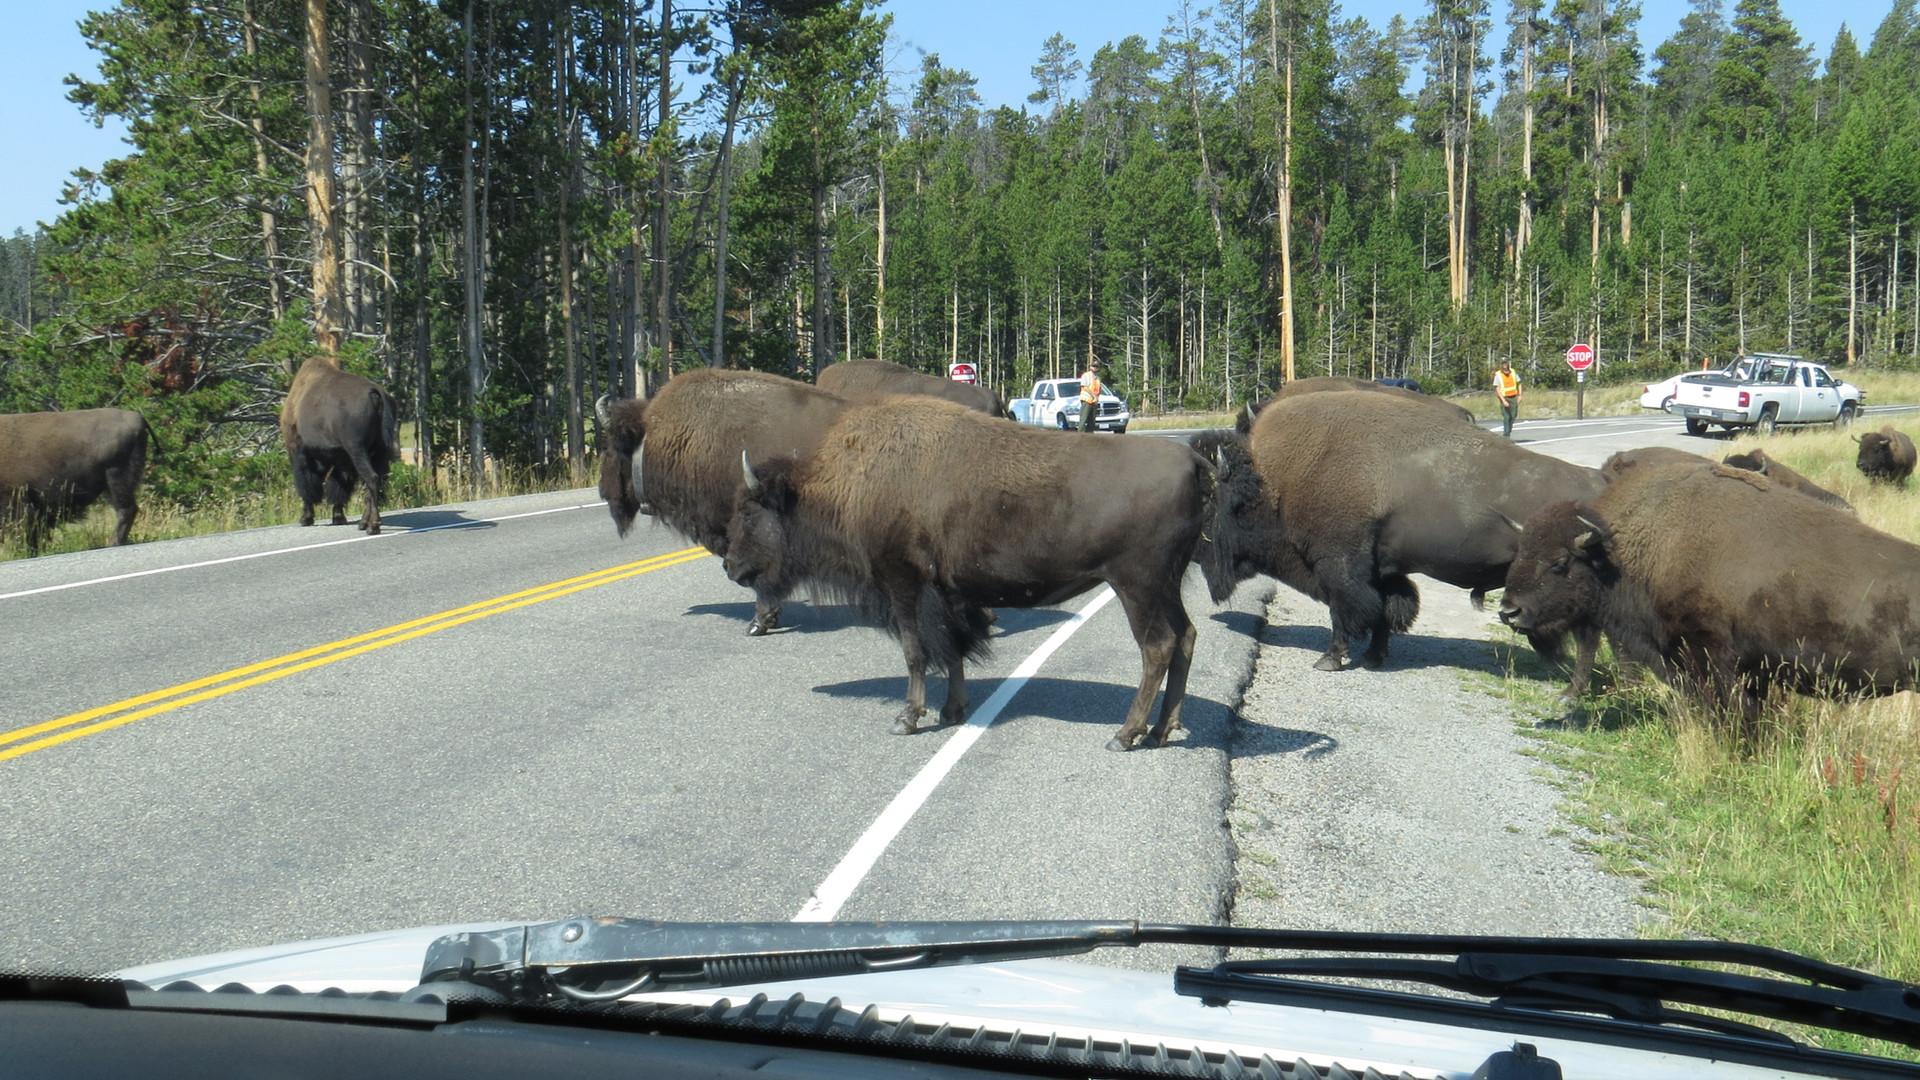 yellowstone-park-tour-bison-herd.JPG